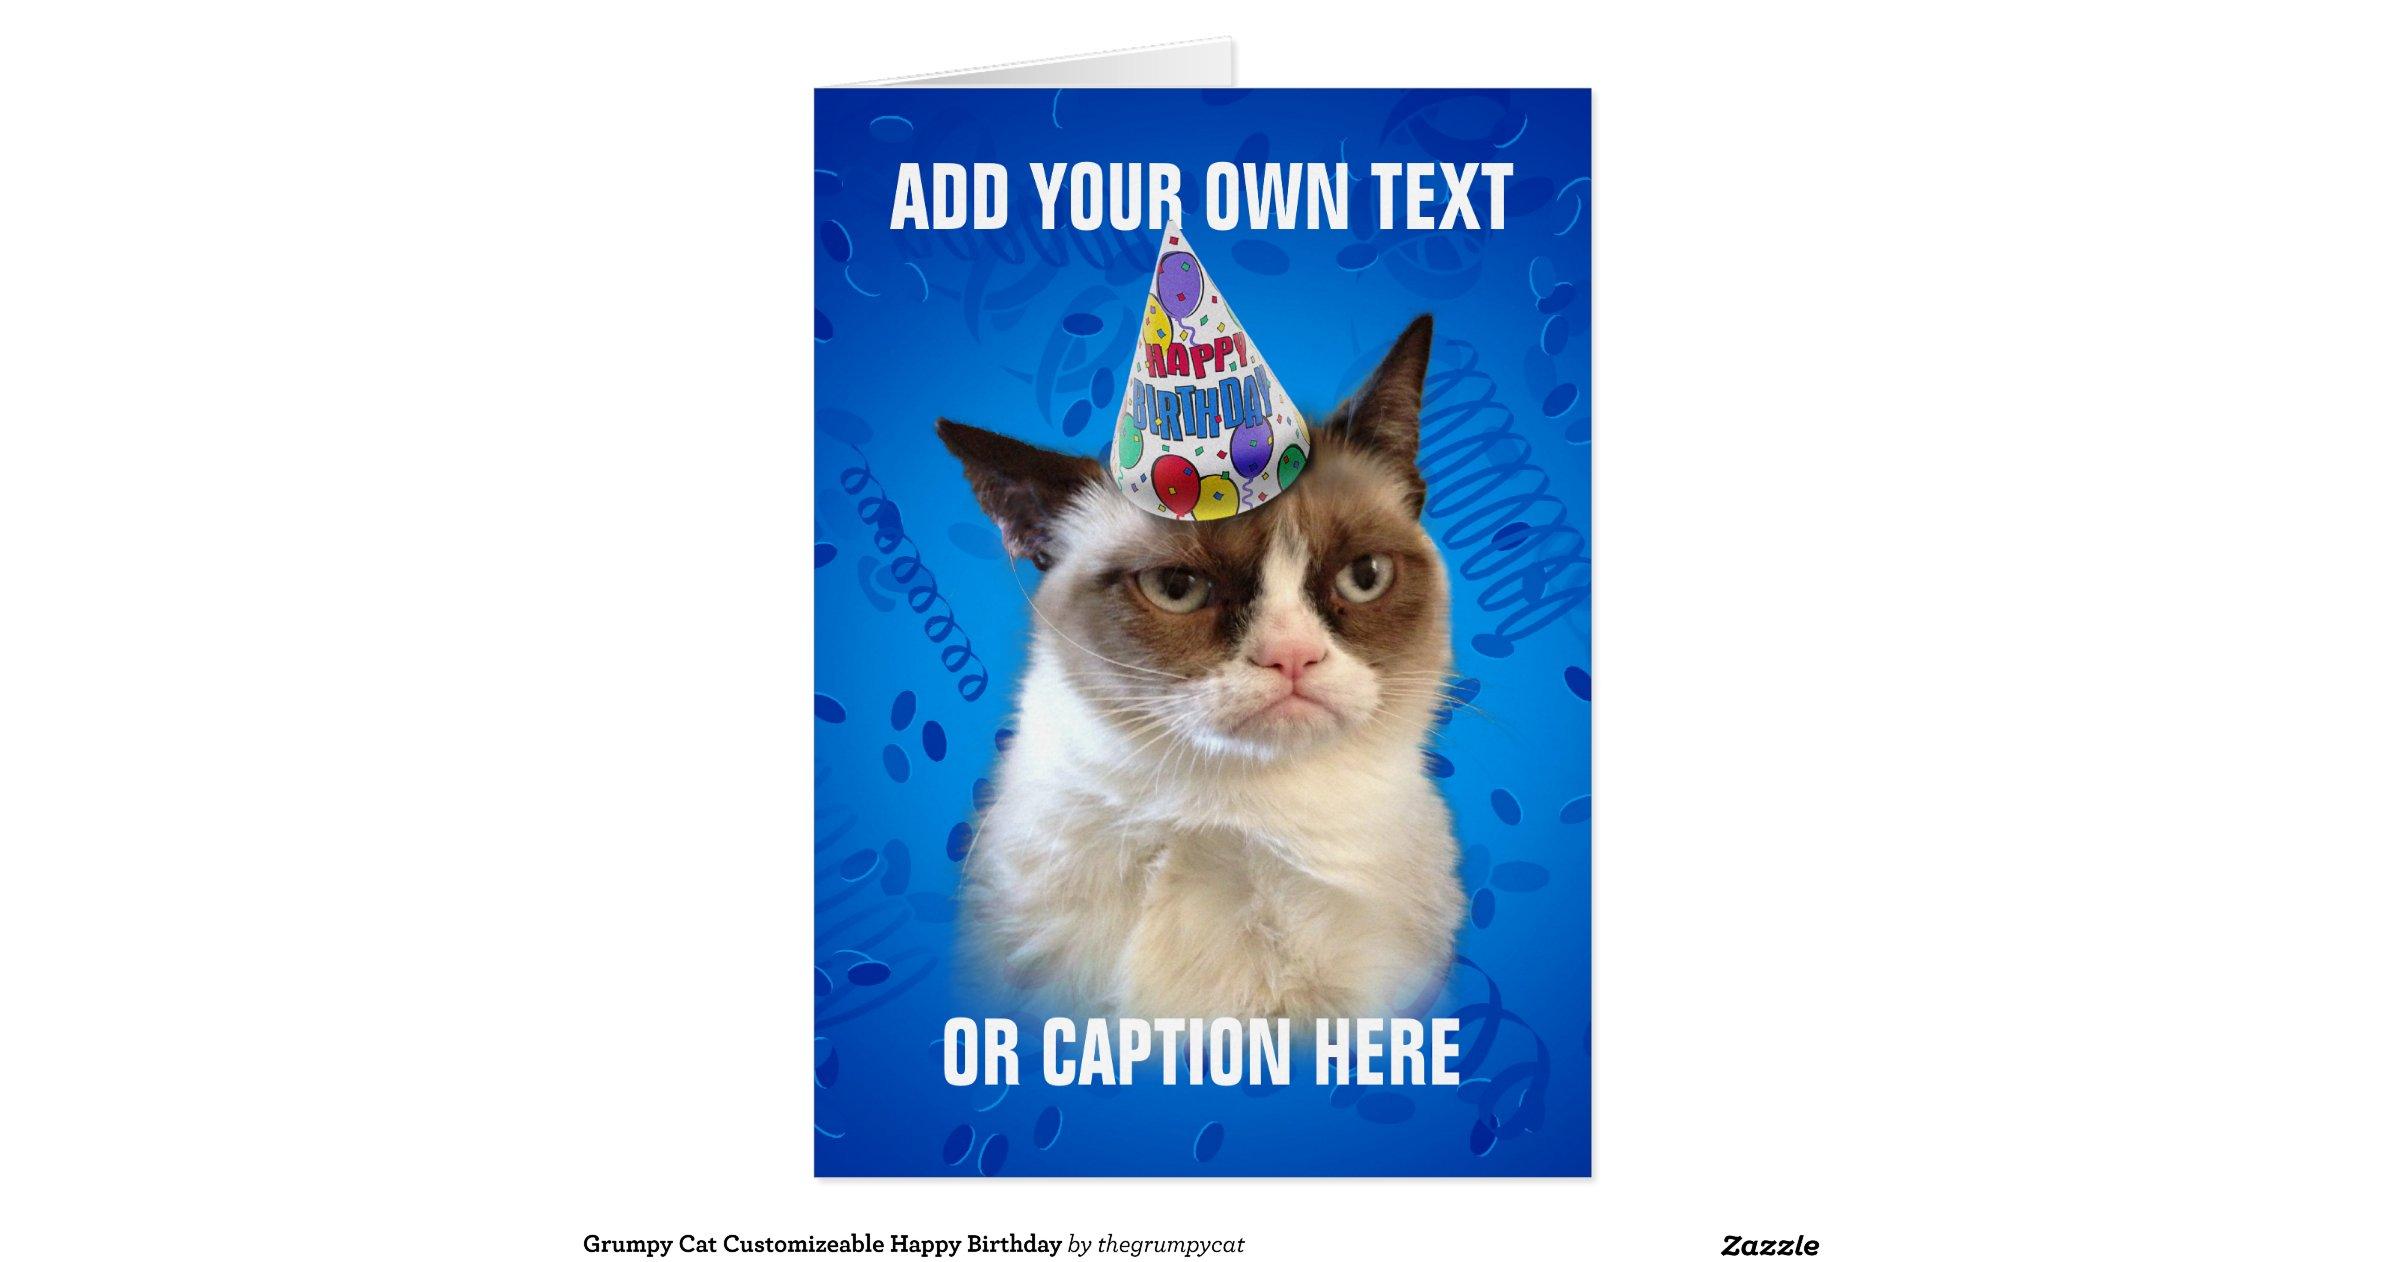 grumpy cat customizeable happy birthday greeting card  zazzle